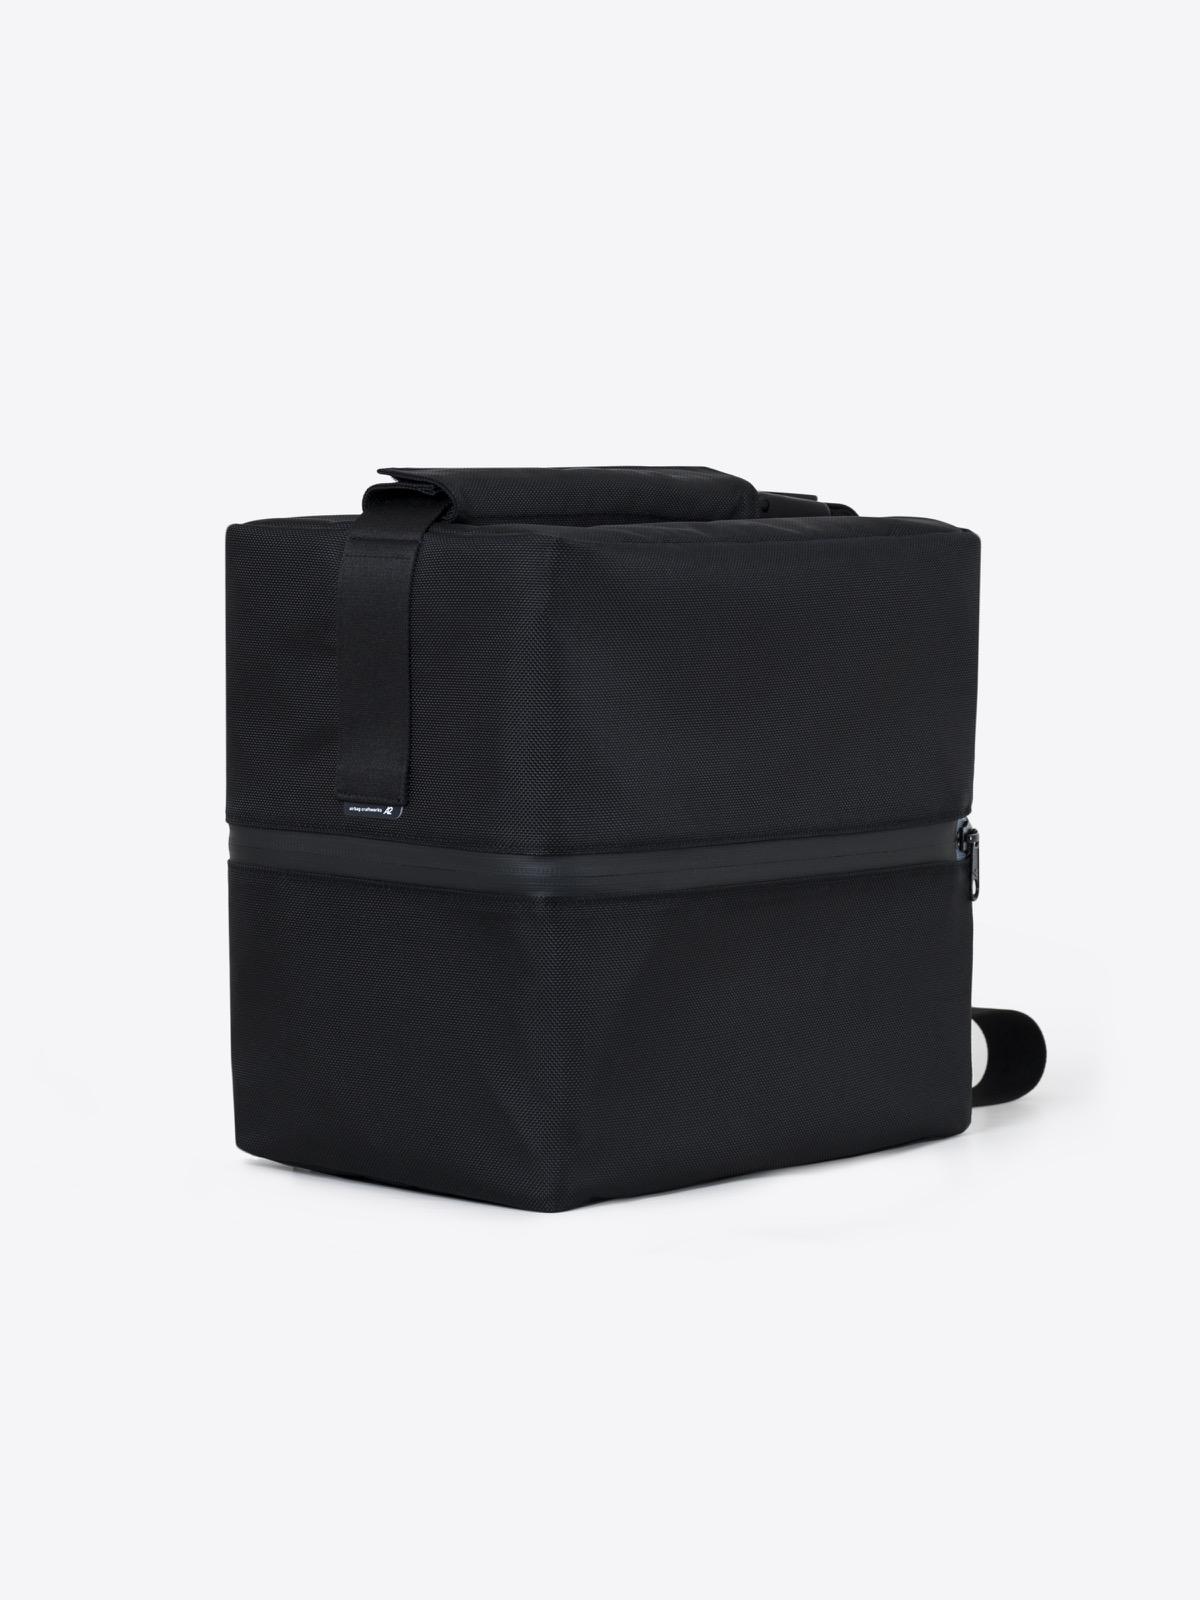 A2 ballistic  nylon black stealth edition